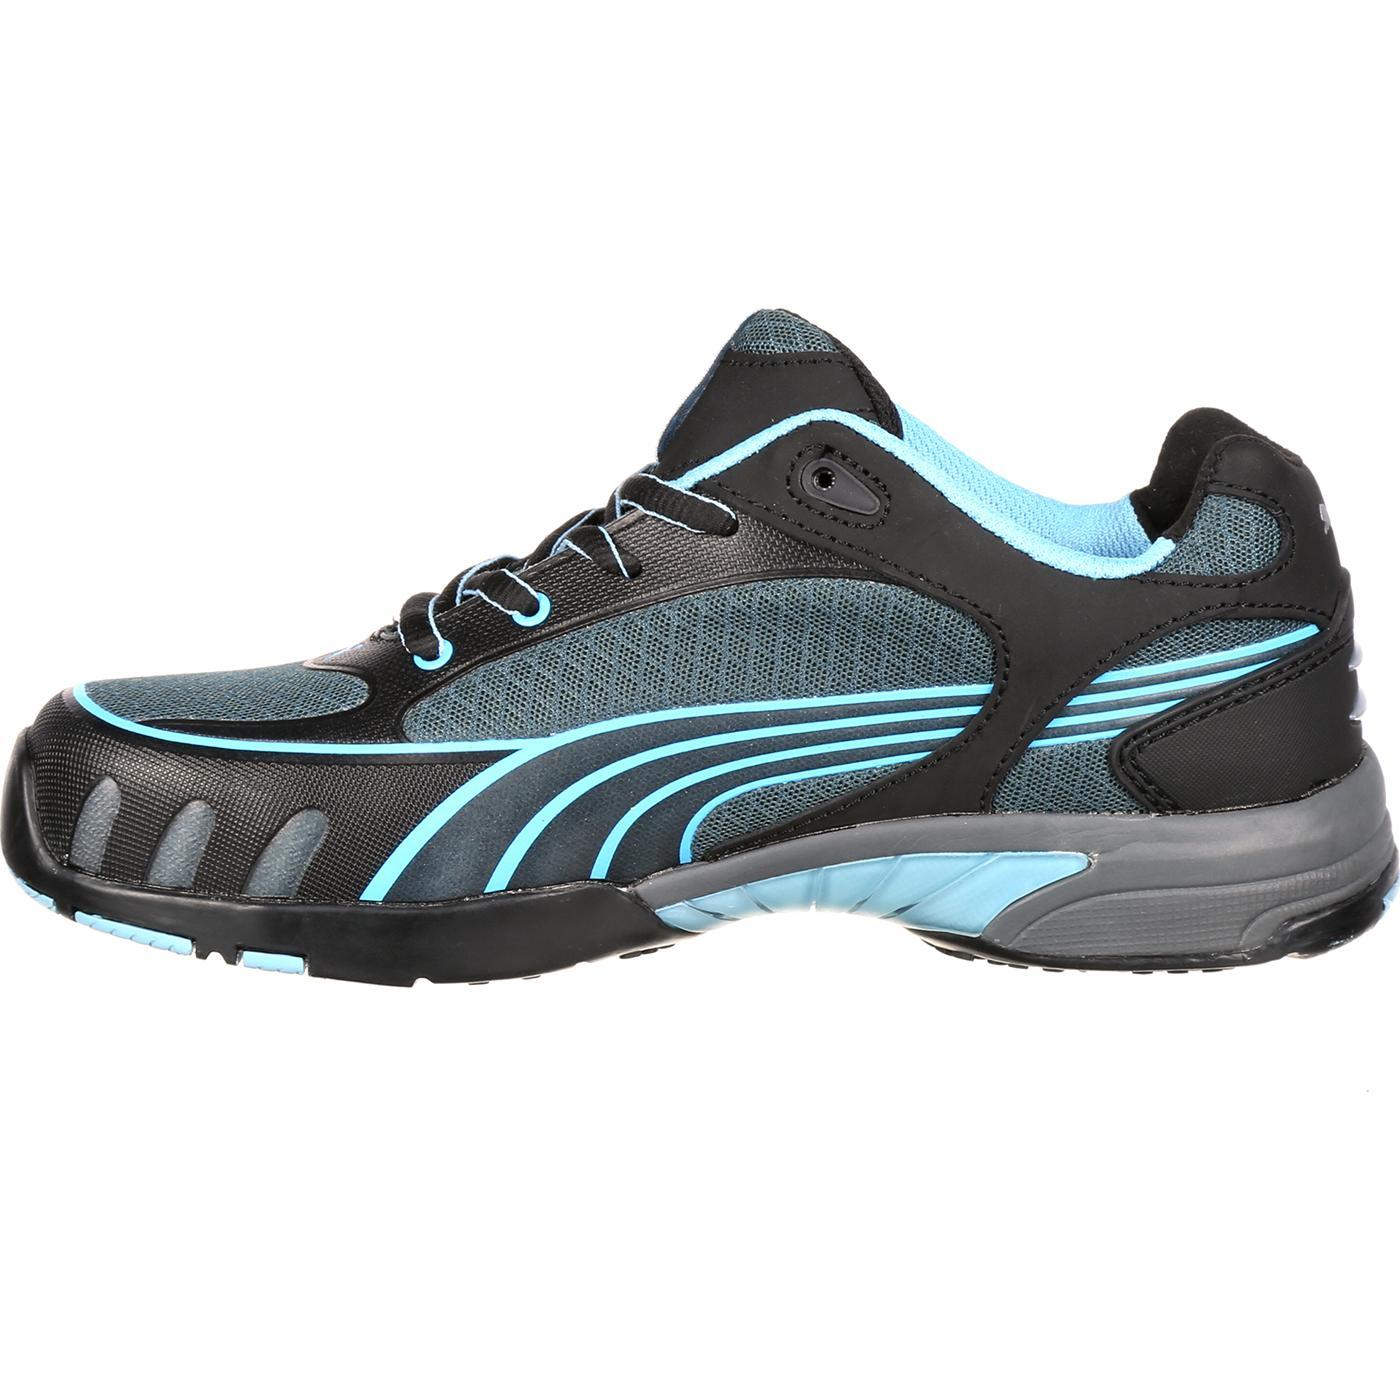 s steel toe athletic work shoe p642825